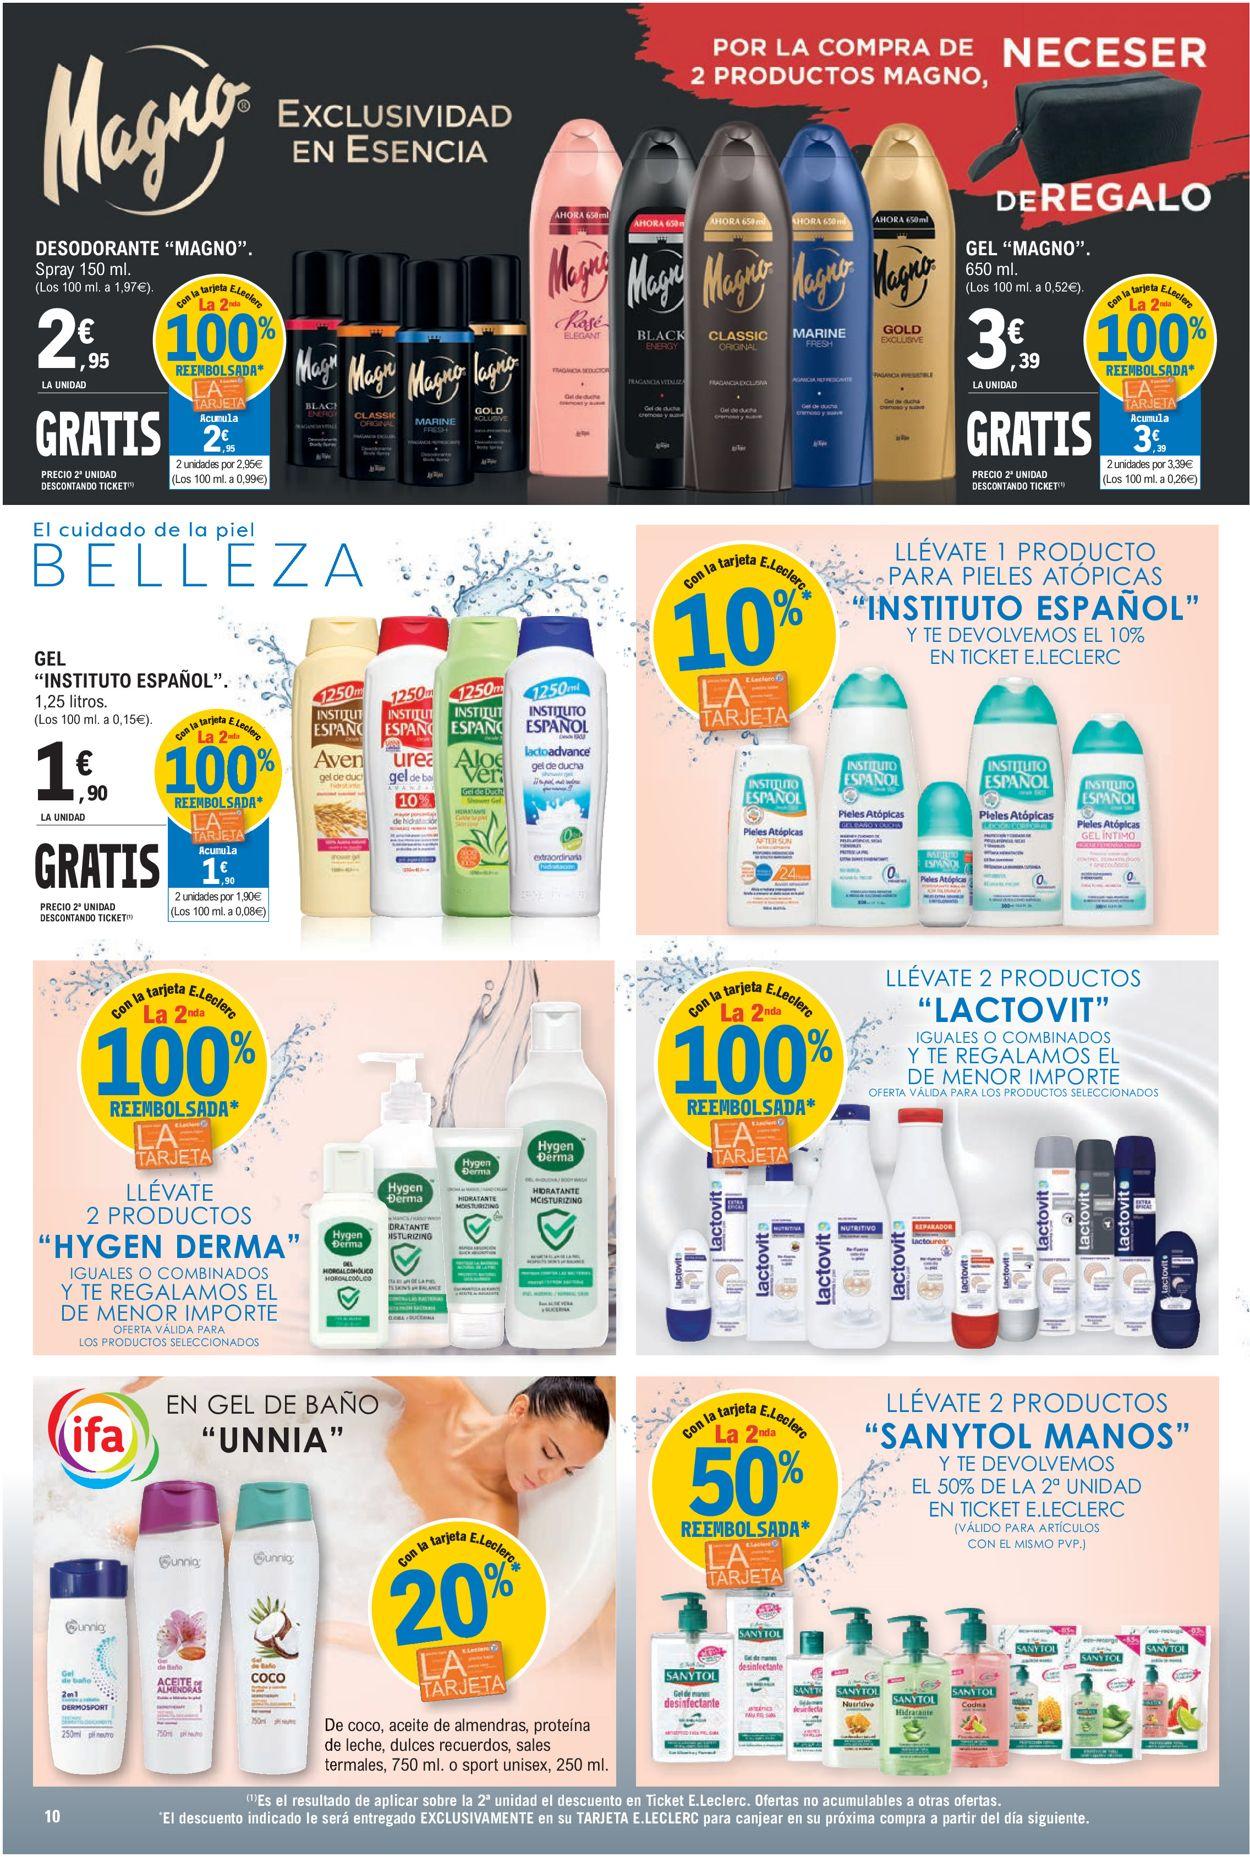 E.leclerc Folleto - 26.05-06.06.2021 (Página 10)